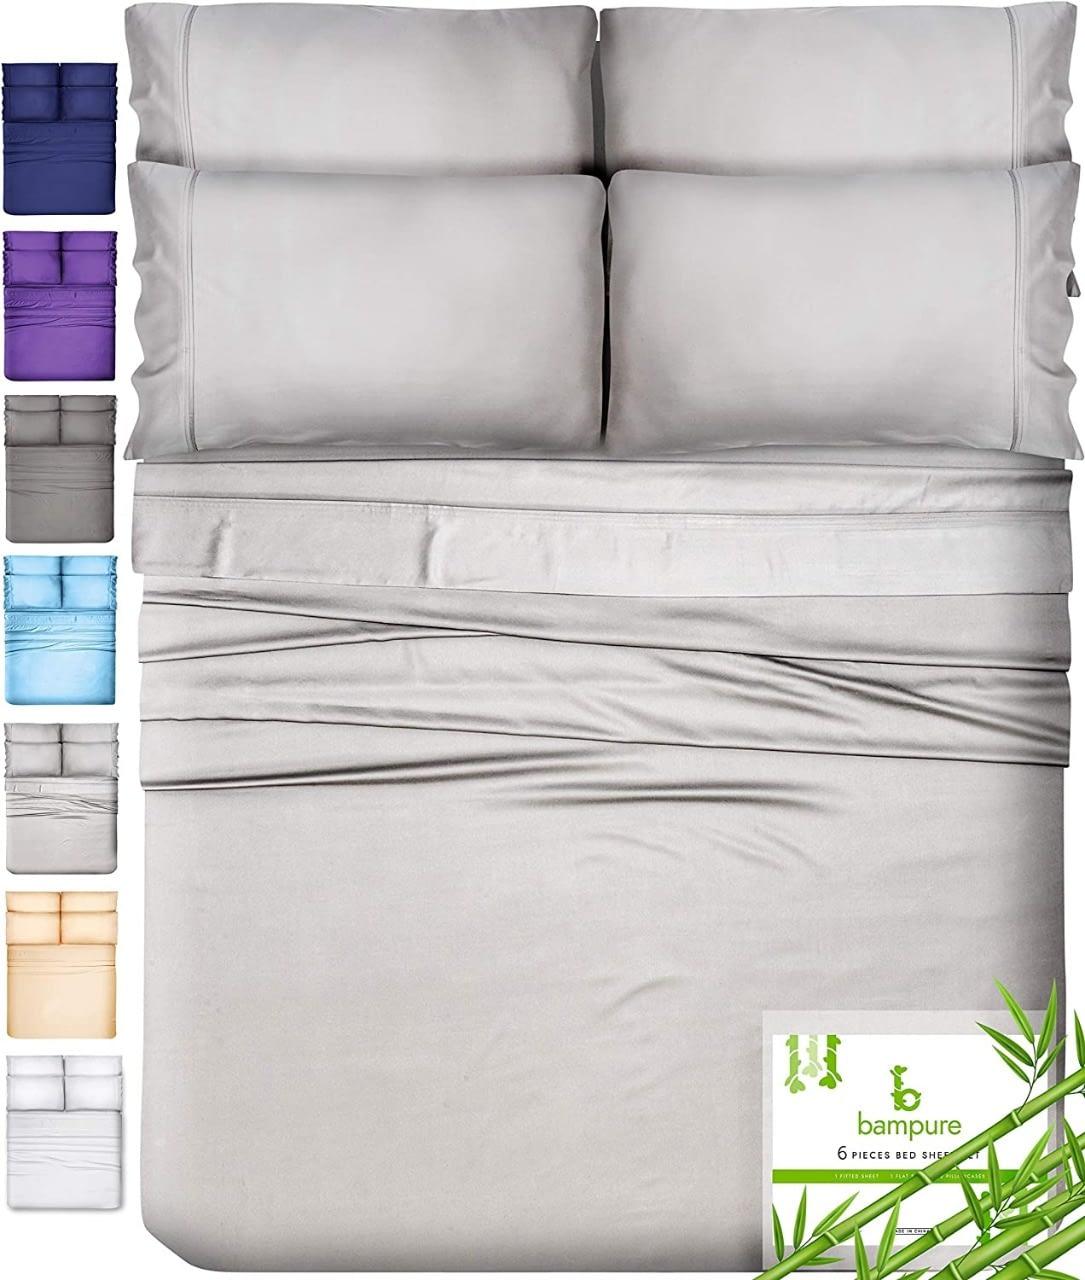 BAMPURE 100% Organic Bamboo Sheets